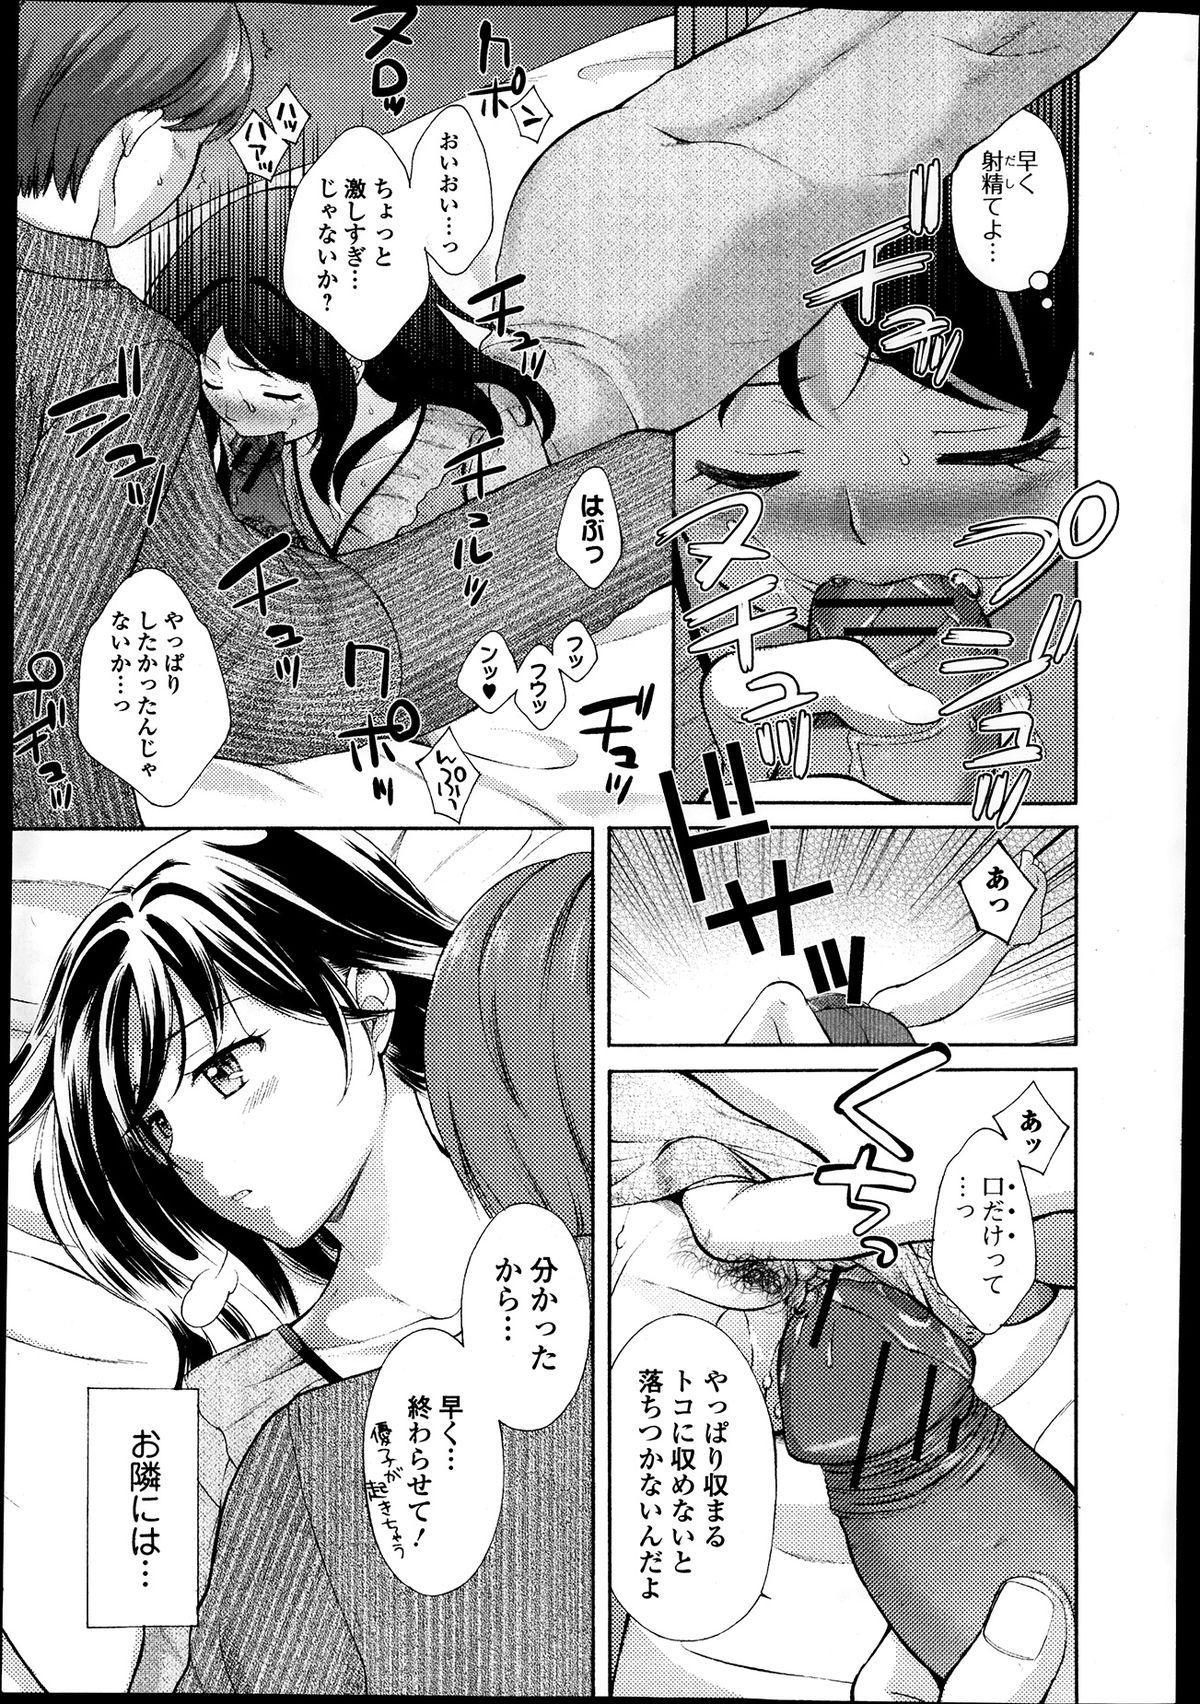 Bishoujo Kakumei KIWAME Road Vol.9 12